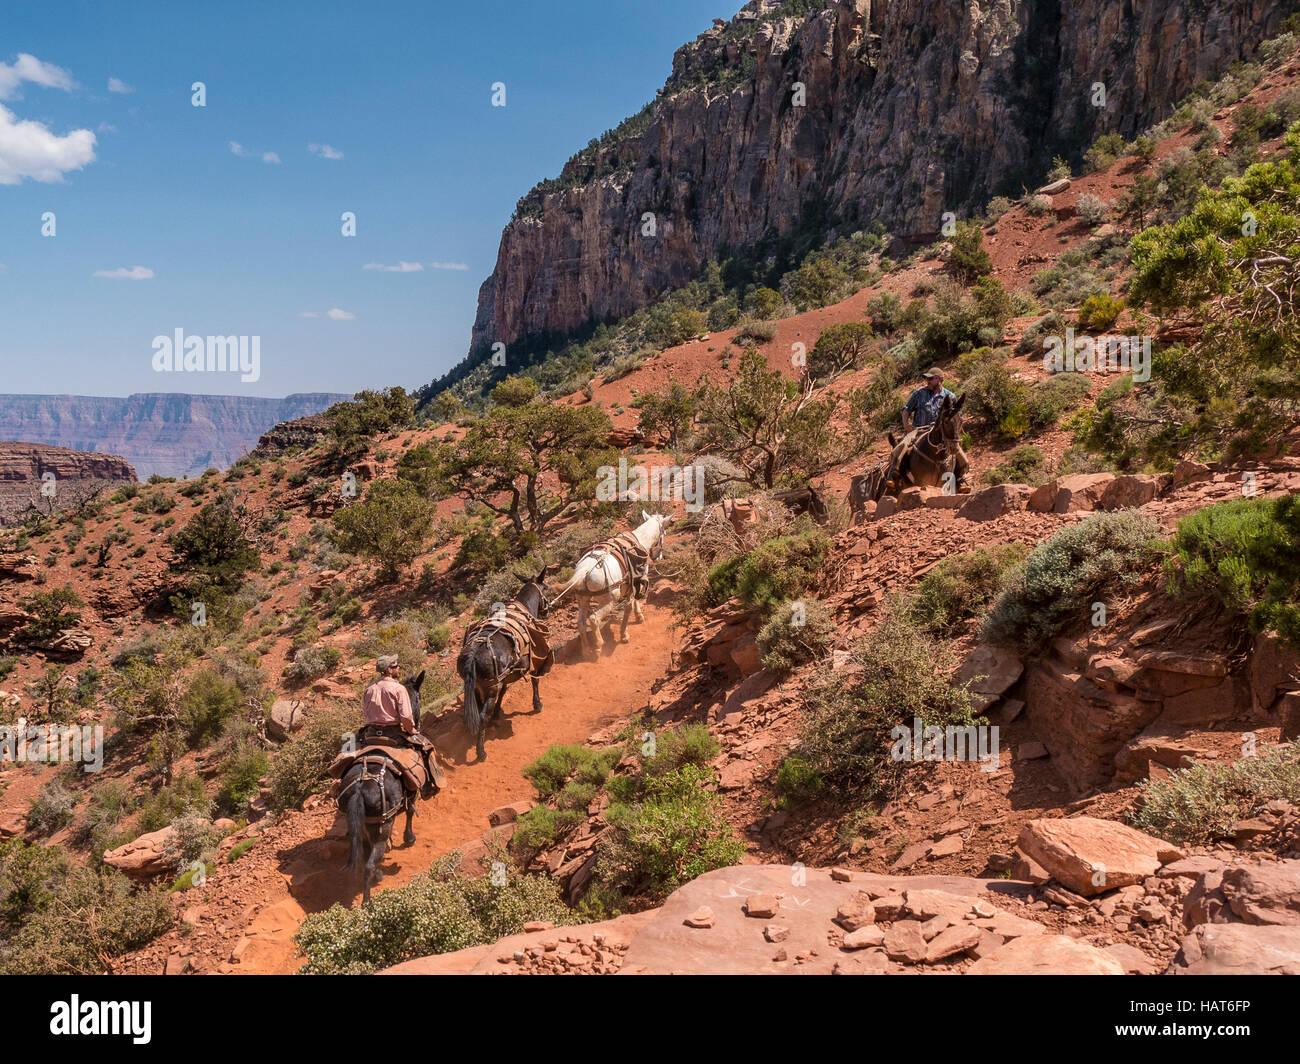 Mules doing trail maintenance, Cedar Ridge area, South Kaibab Trail, Grand Canyon South Rim, Arizona. - Stock Image